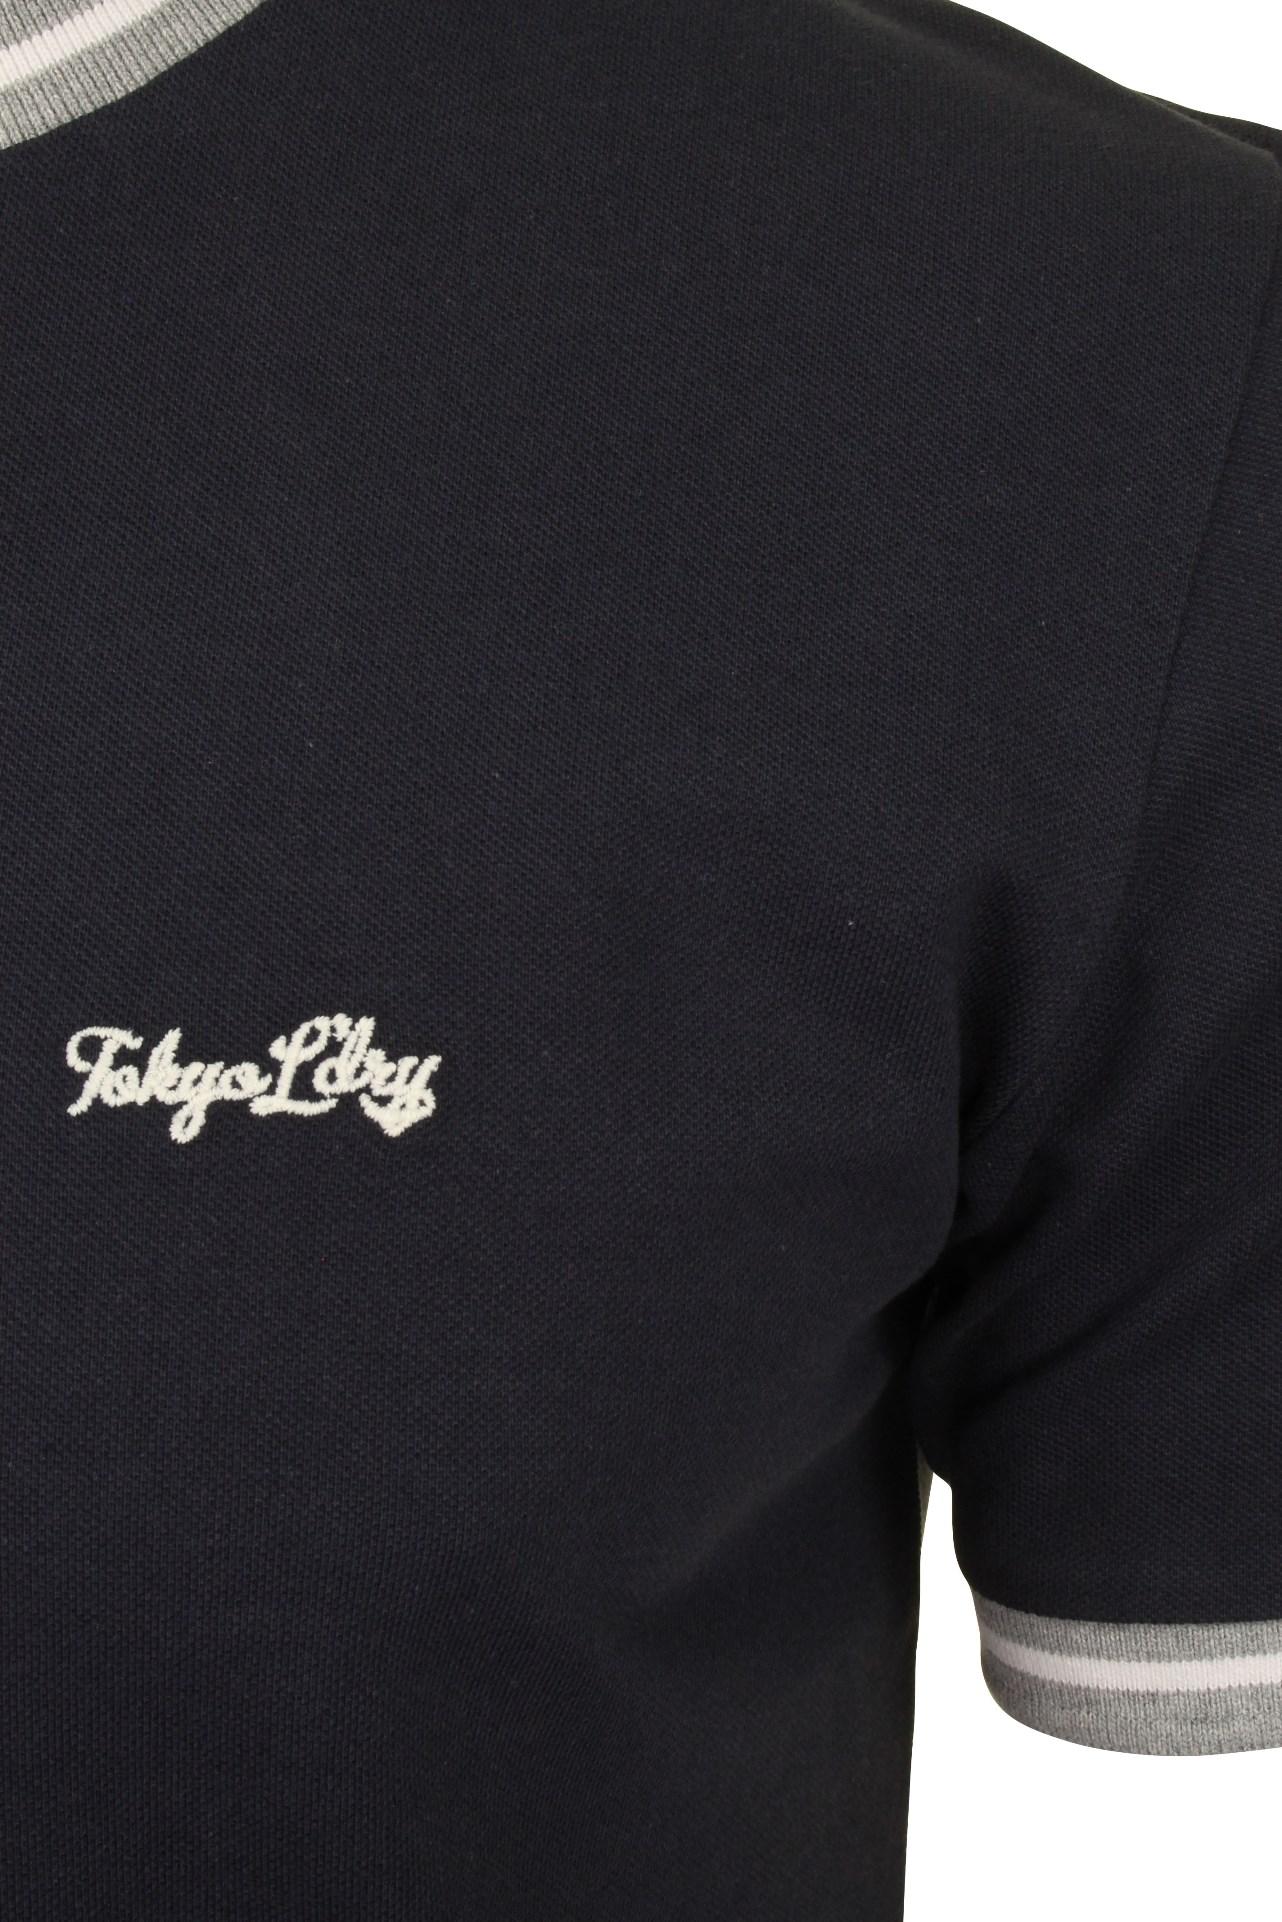 Tokyo-Laundry-Mens-Pique-Crew-Neck-T-Shirt-039-Wentworth-039 thumbnail 7